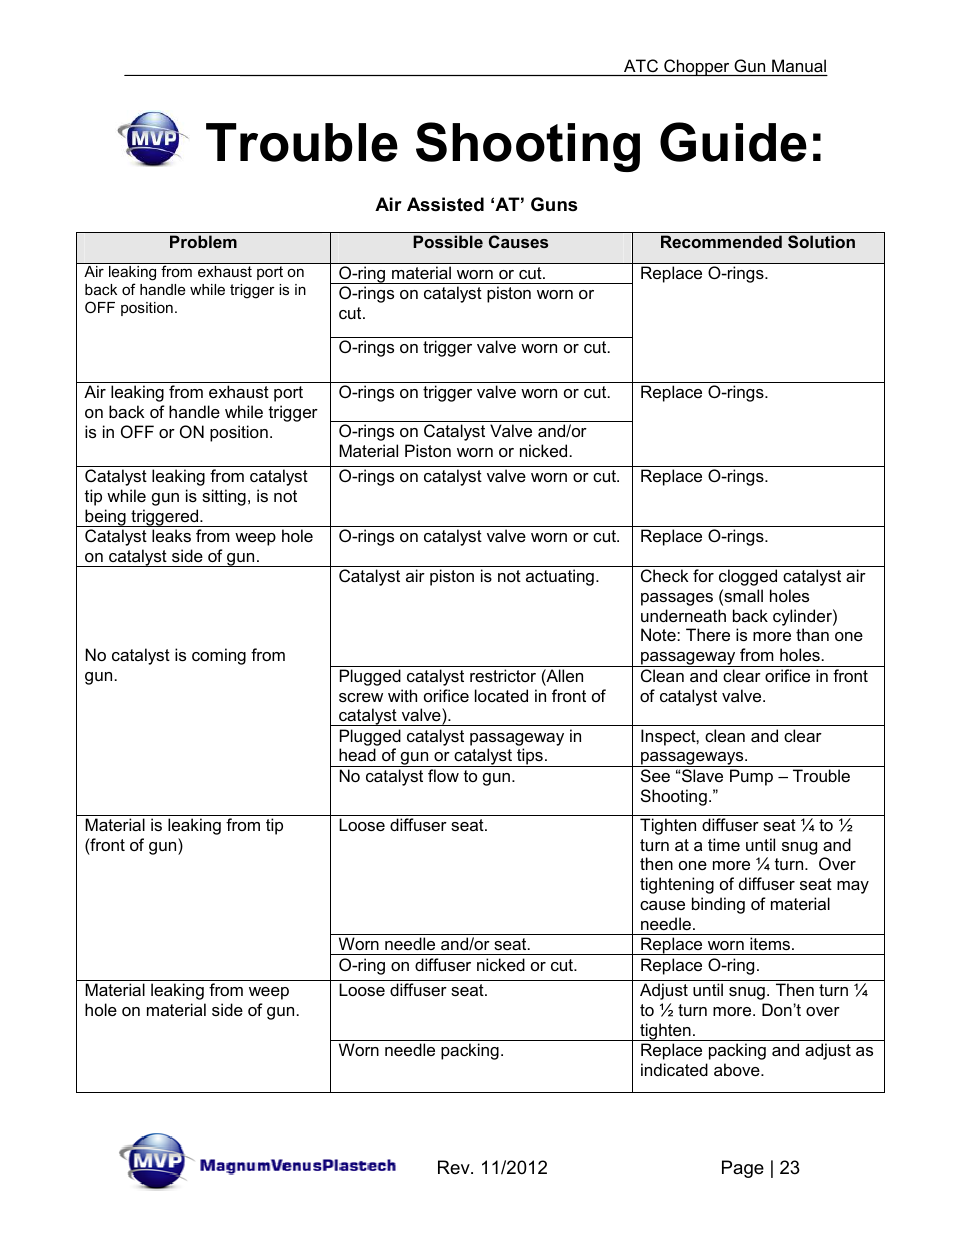 Trouble shooting guide | Magnum Venus Plastech ATG chopper Gun User Manual  | Page 23 / 60